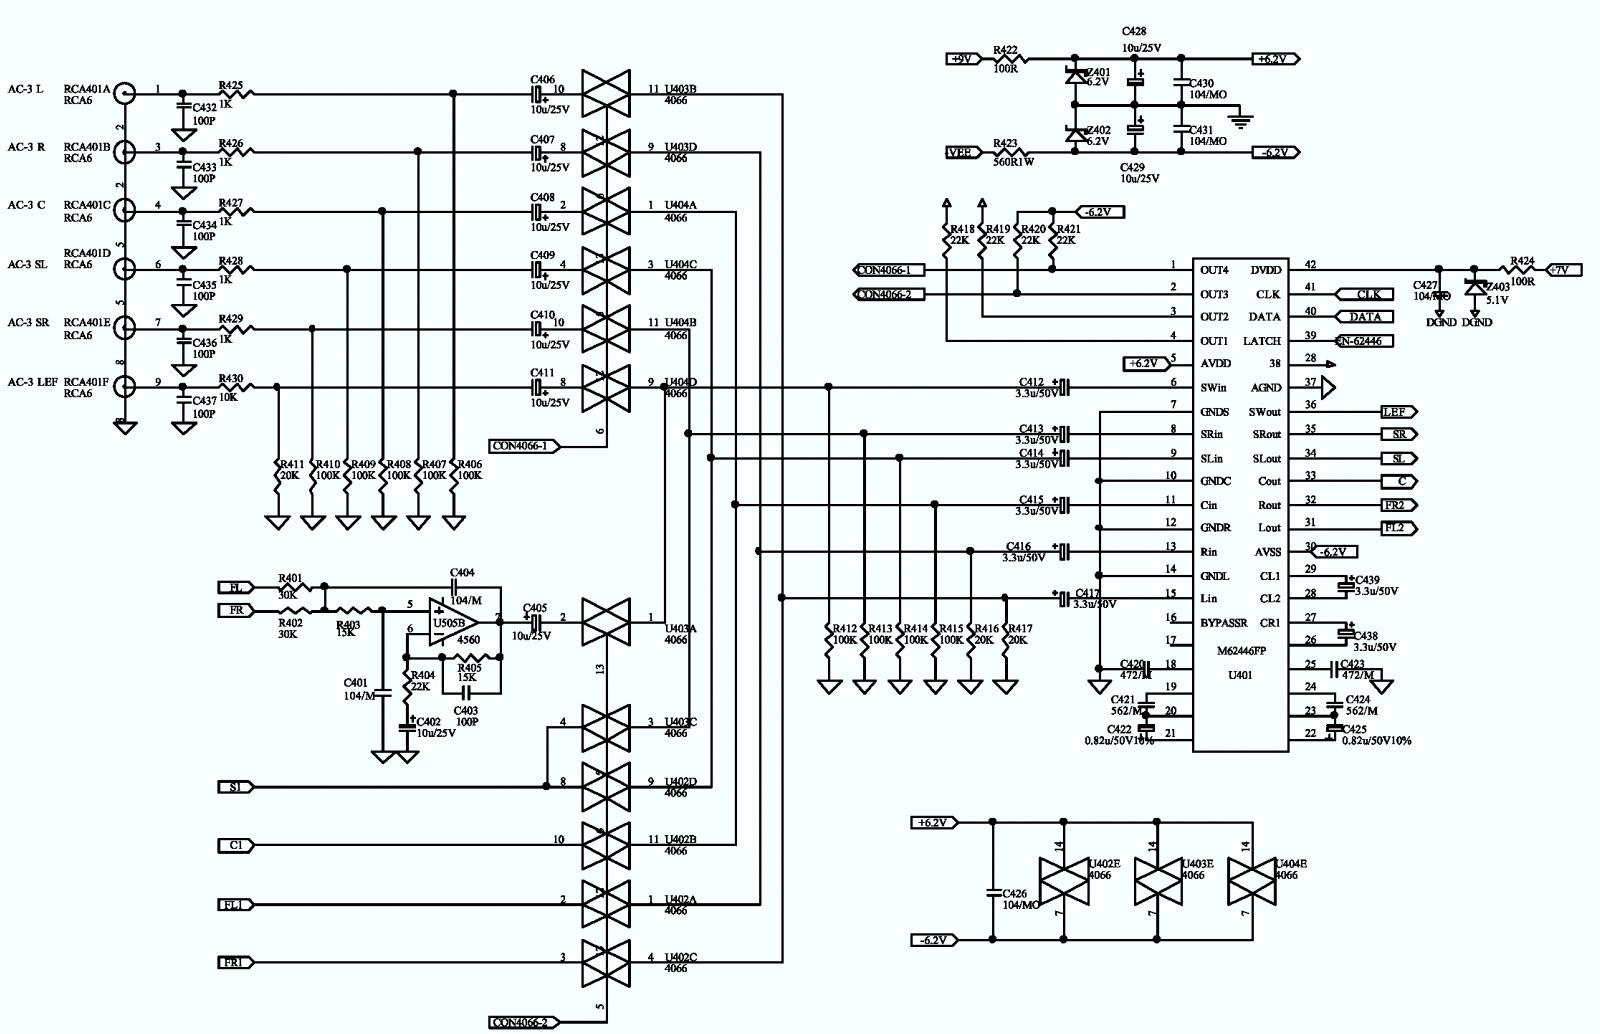 2012 ford focus audio system wiring diagram jbl esc230 120v speaker system – schematic – wiring ... 70 volt audio system wiring diagram